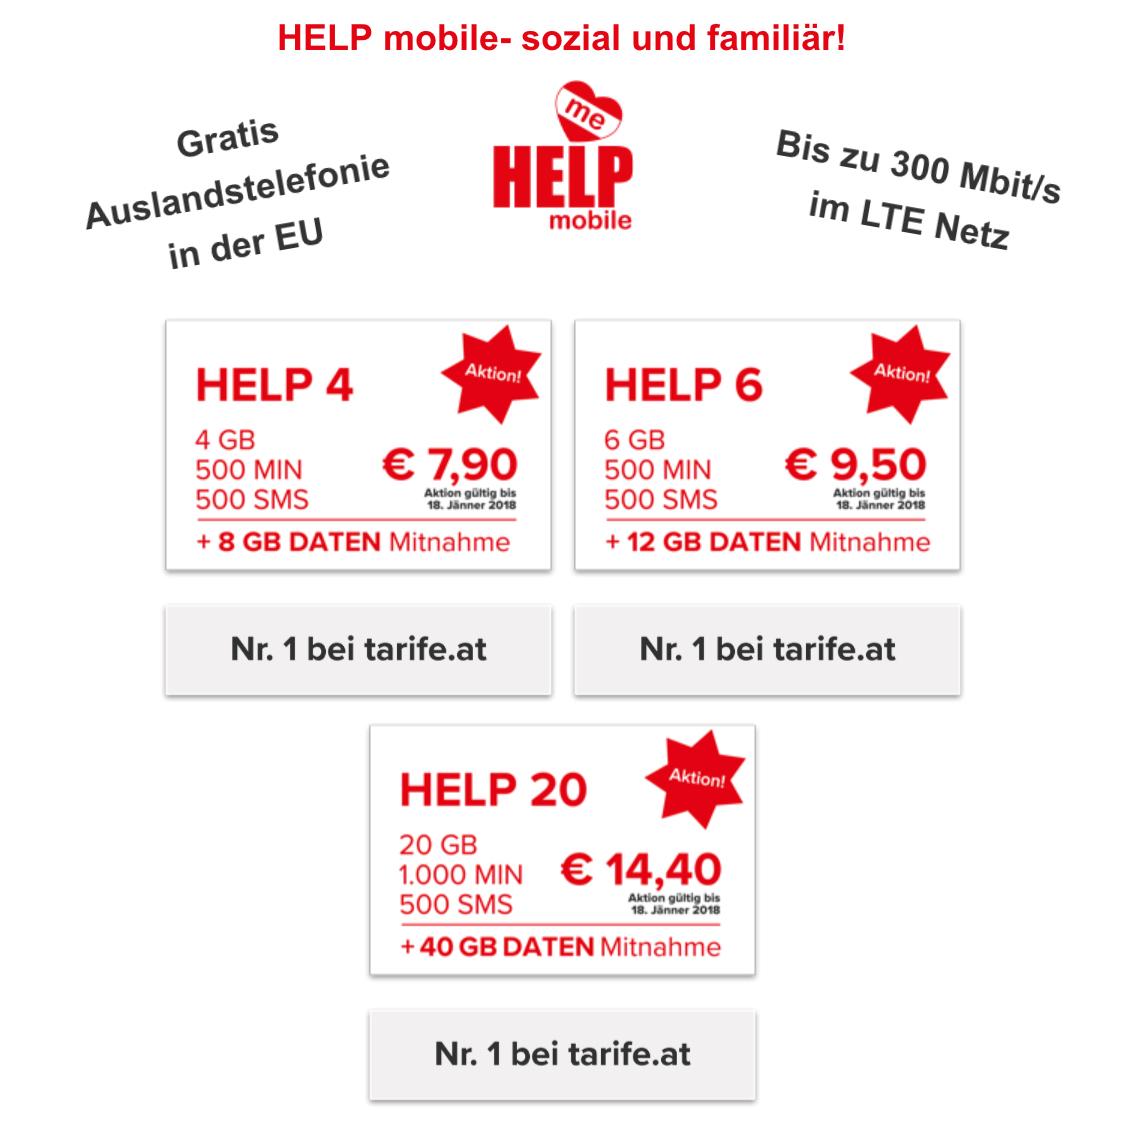 Help Mobile - 2 Tarif-Aktionen (1000Min/500SMS/20GB um 14,40 €) - (500Min/500SMS/6GB um 9,90 €)